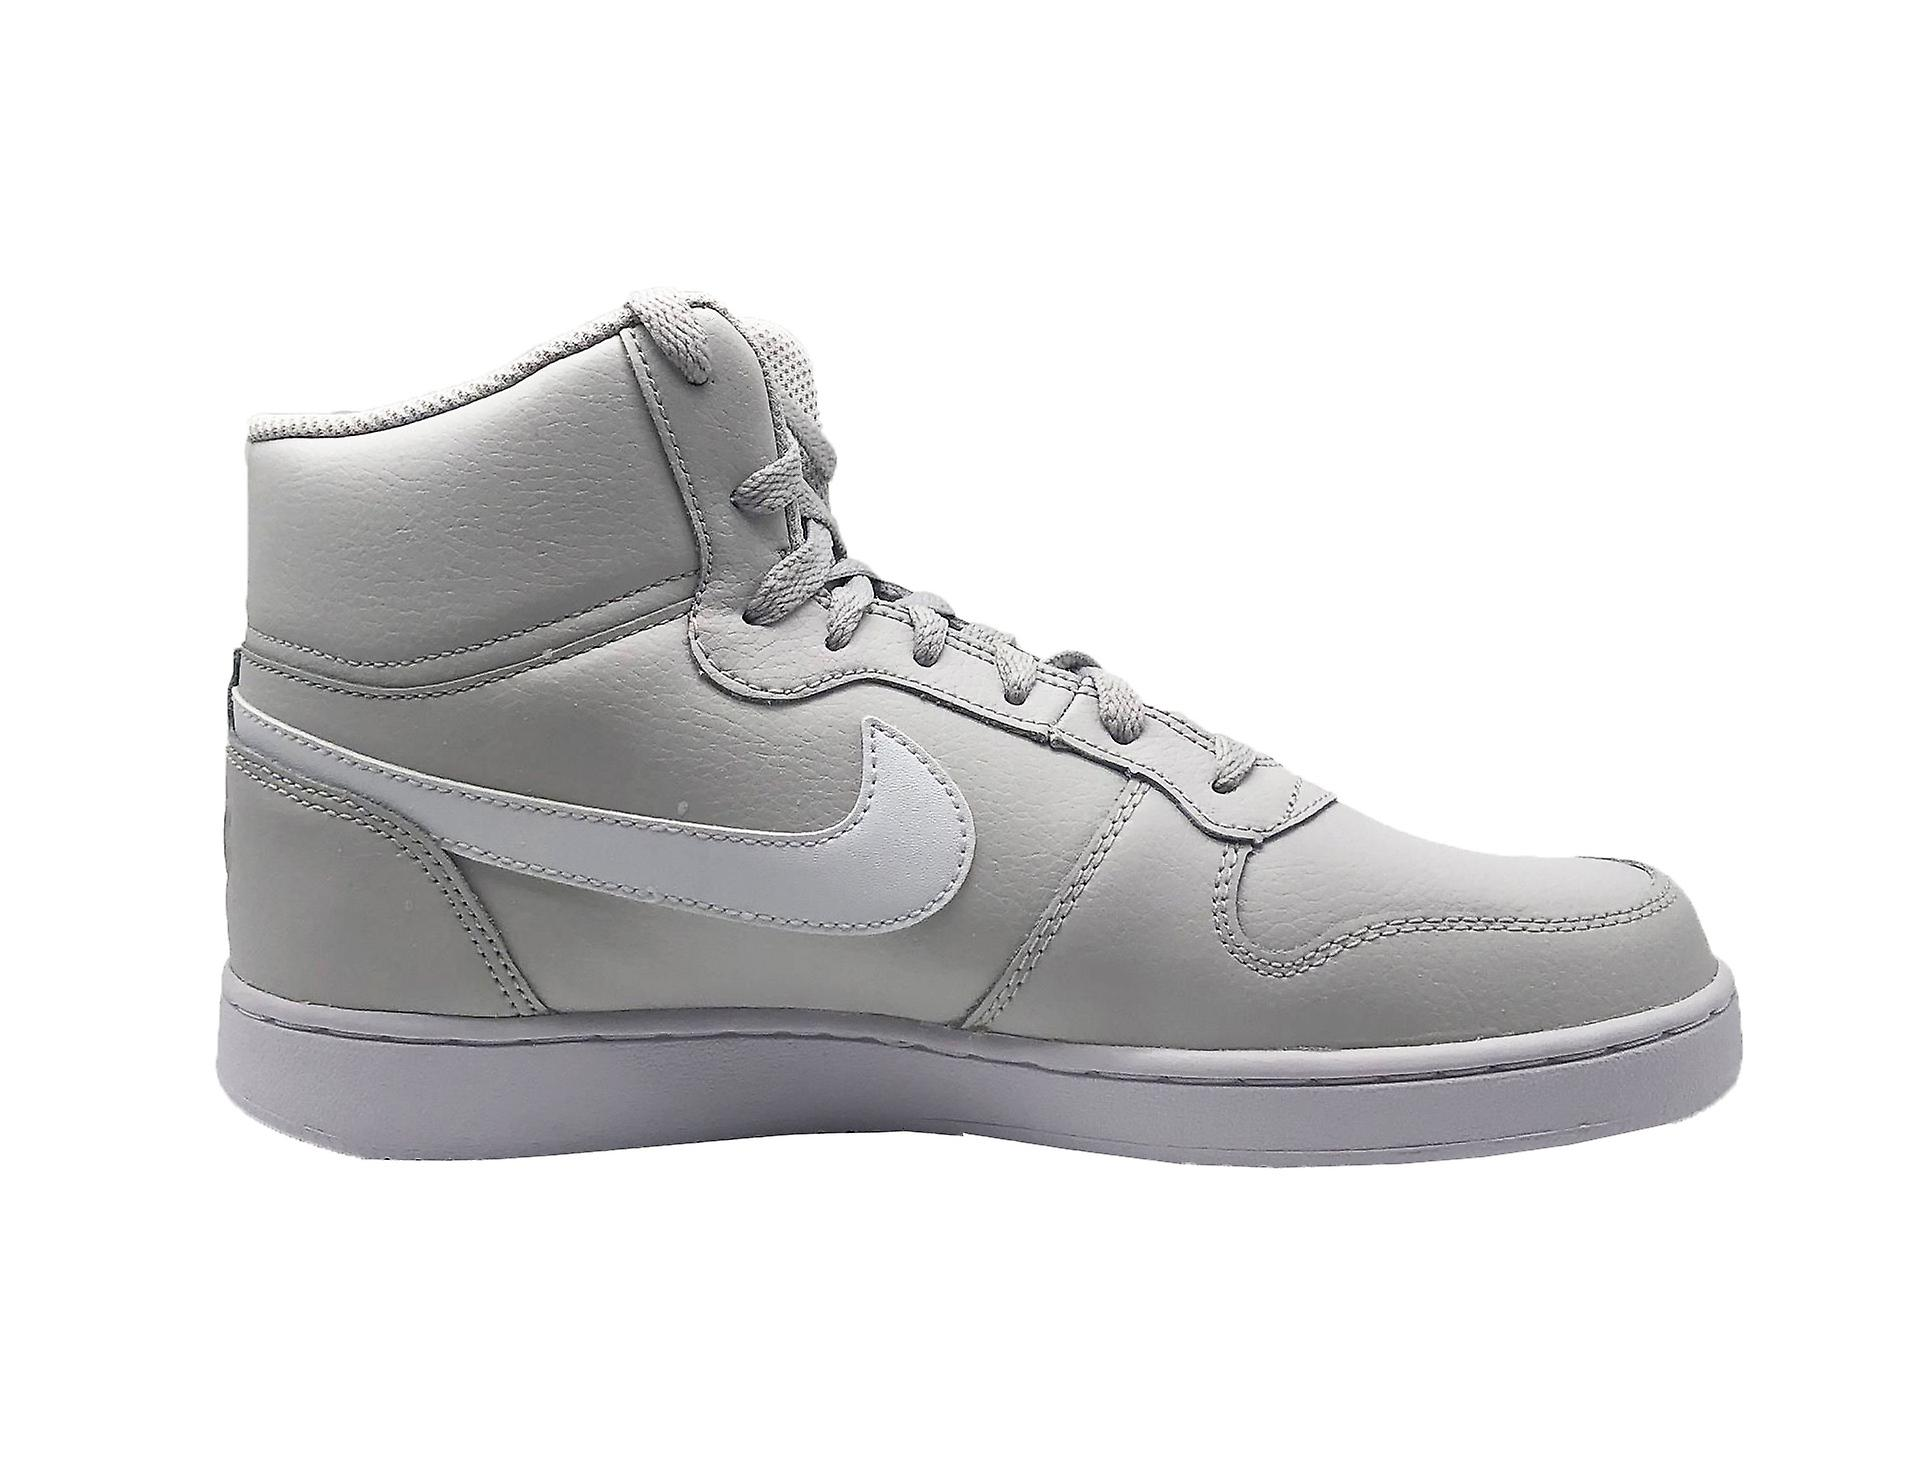 Nike Ebernon Mid AQ1773 003 herr utbildare